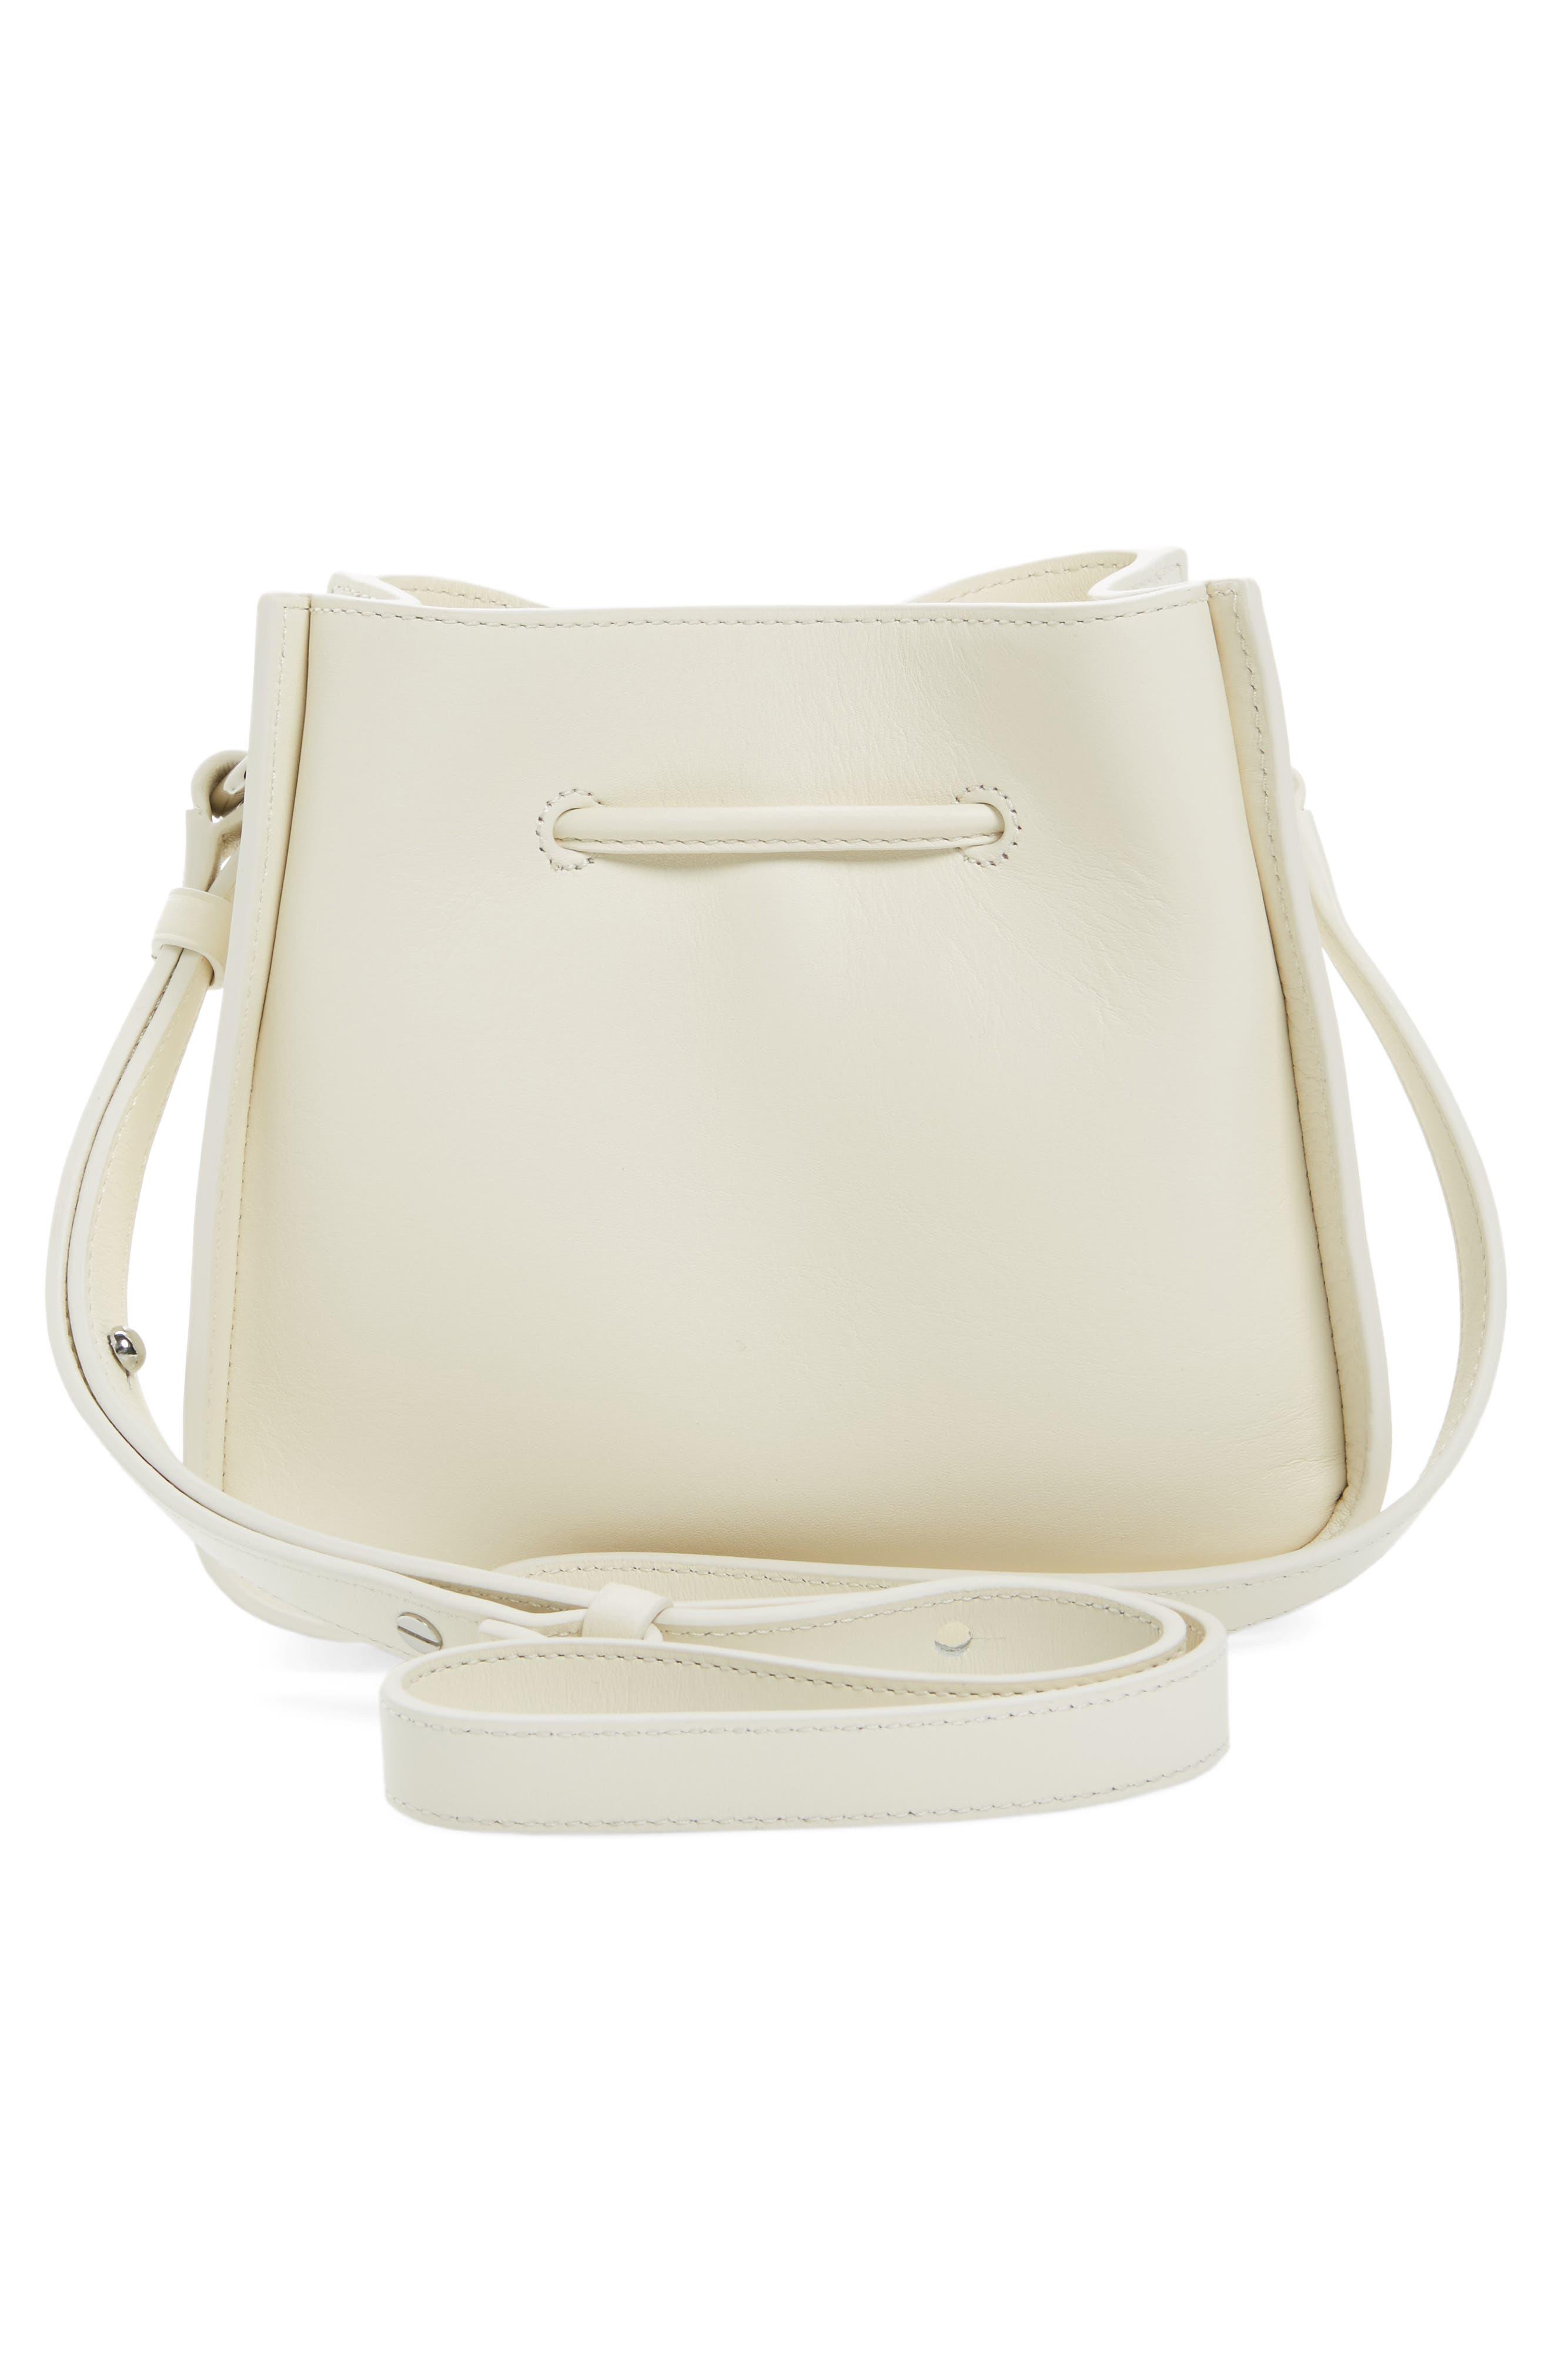 Alternate Image 2  - 3.1 Phillip Lim Mini Soleil Leather Bucket Bag